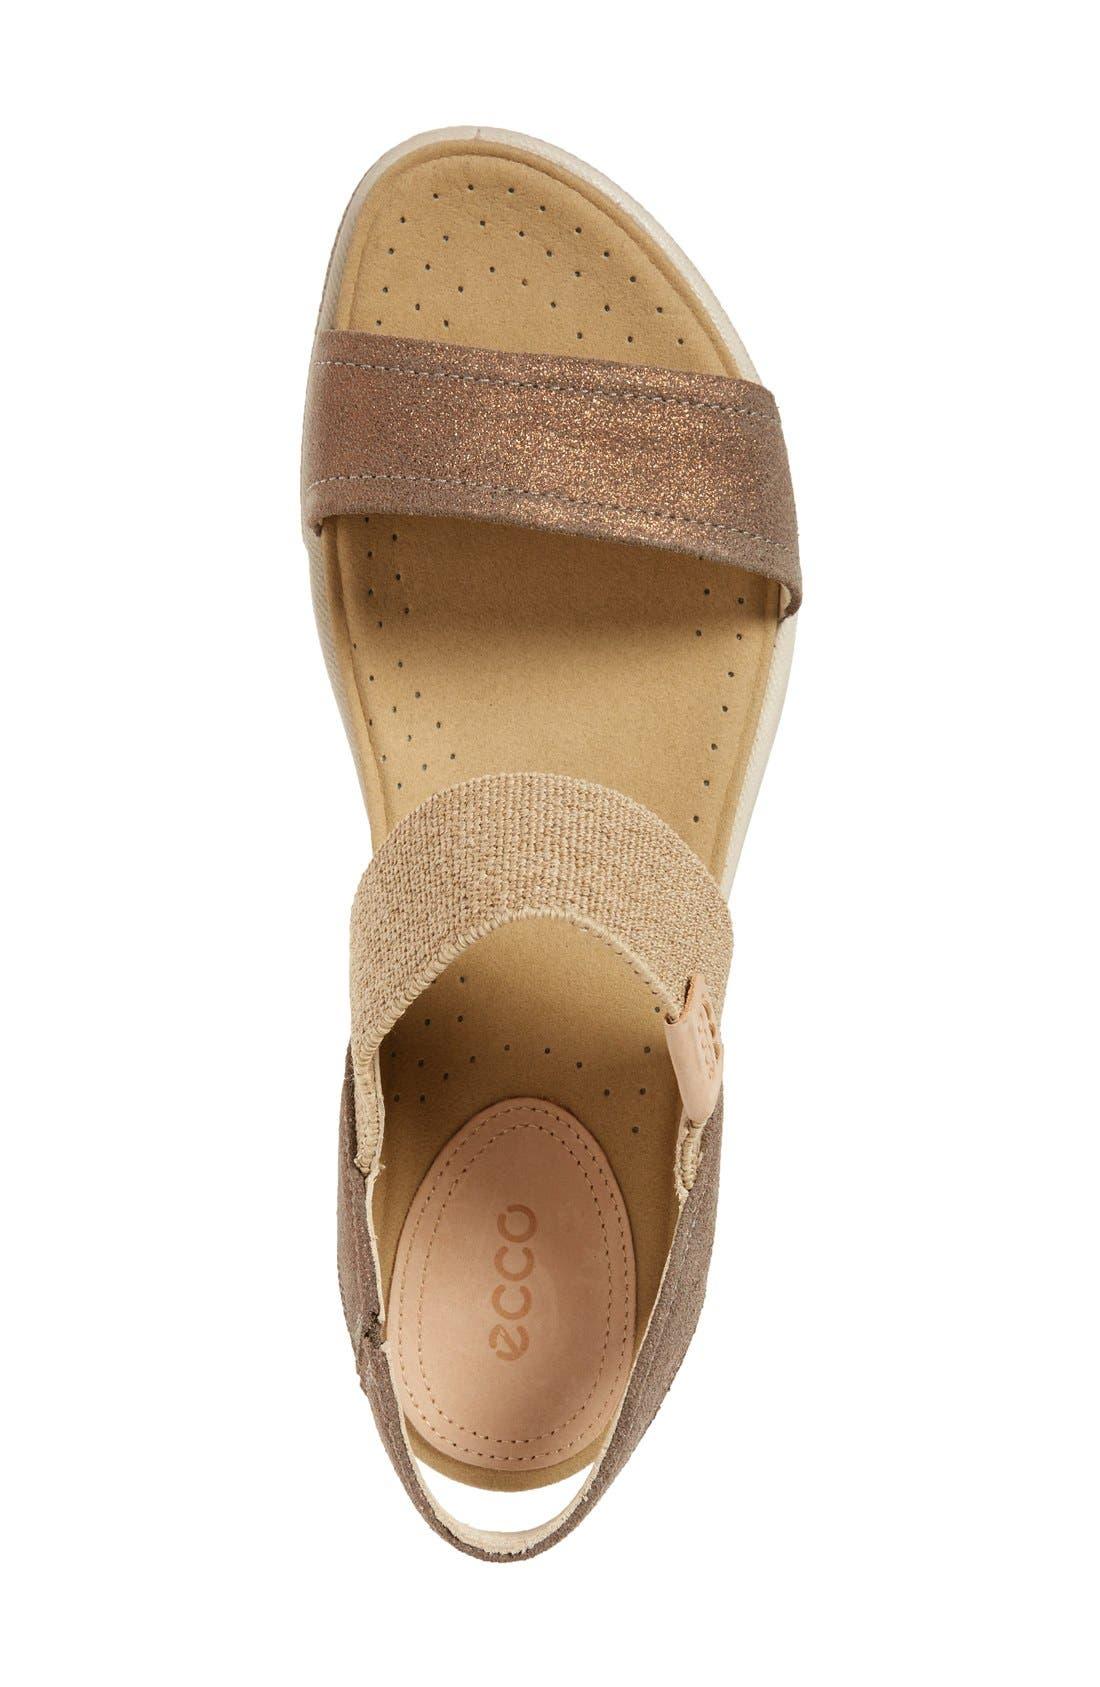 'Damara' Strap Sandal,                             Alternate thumbnail 21, color,